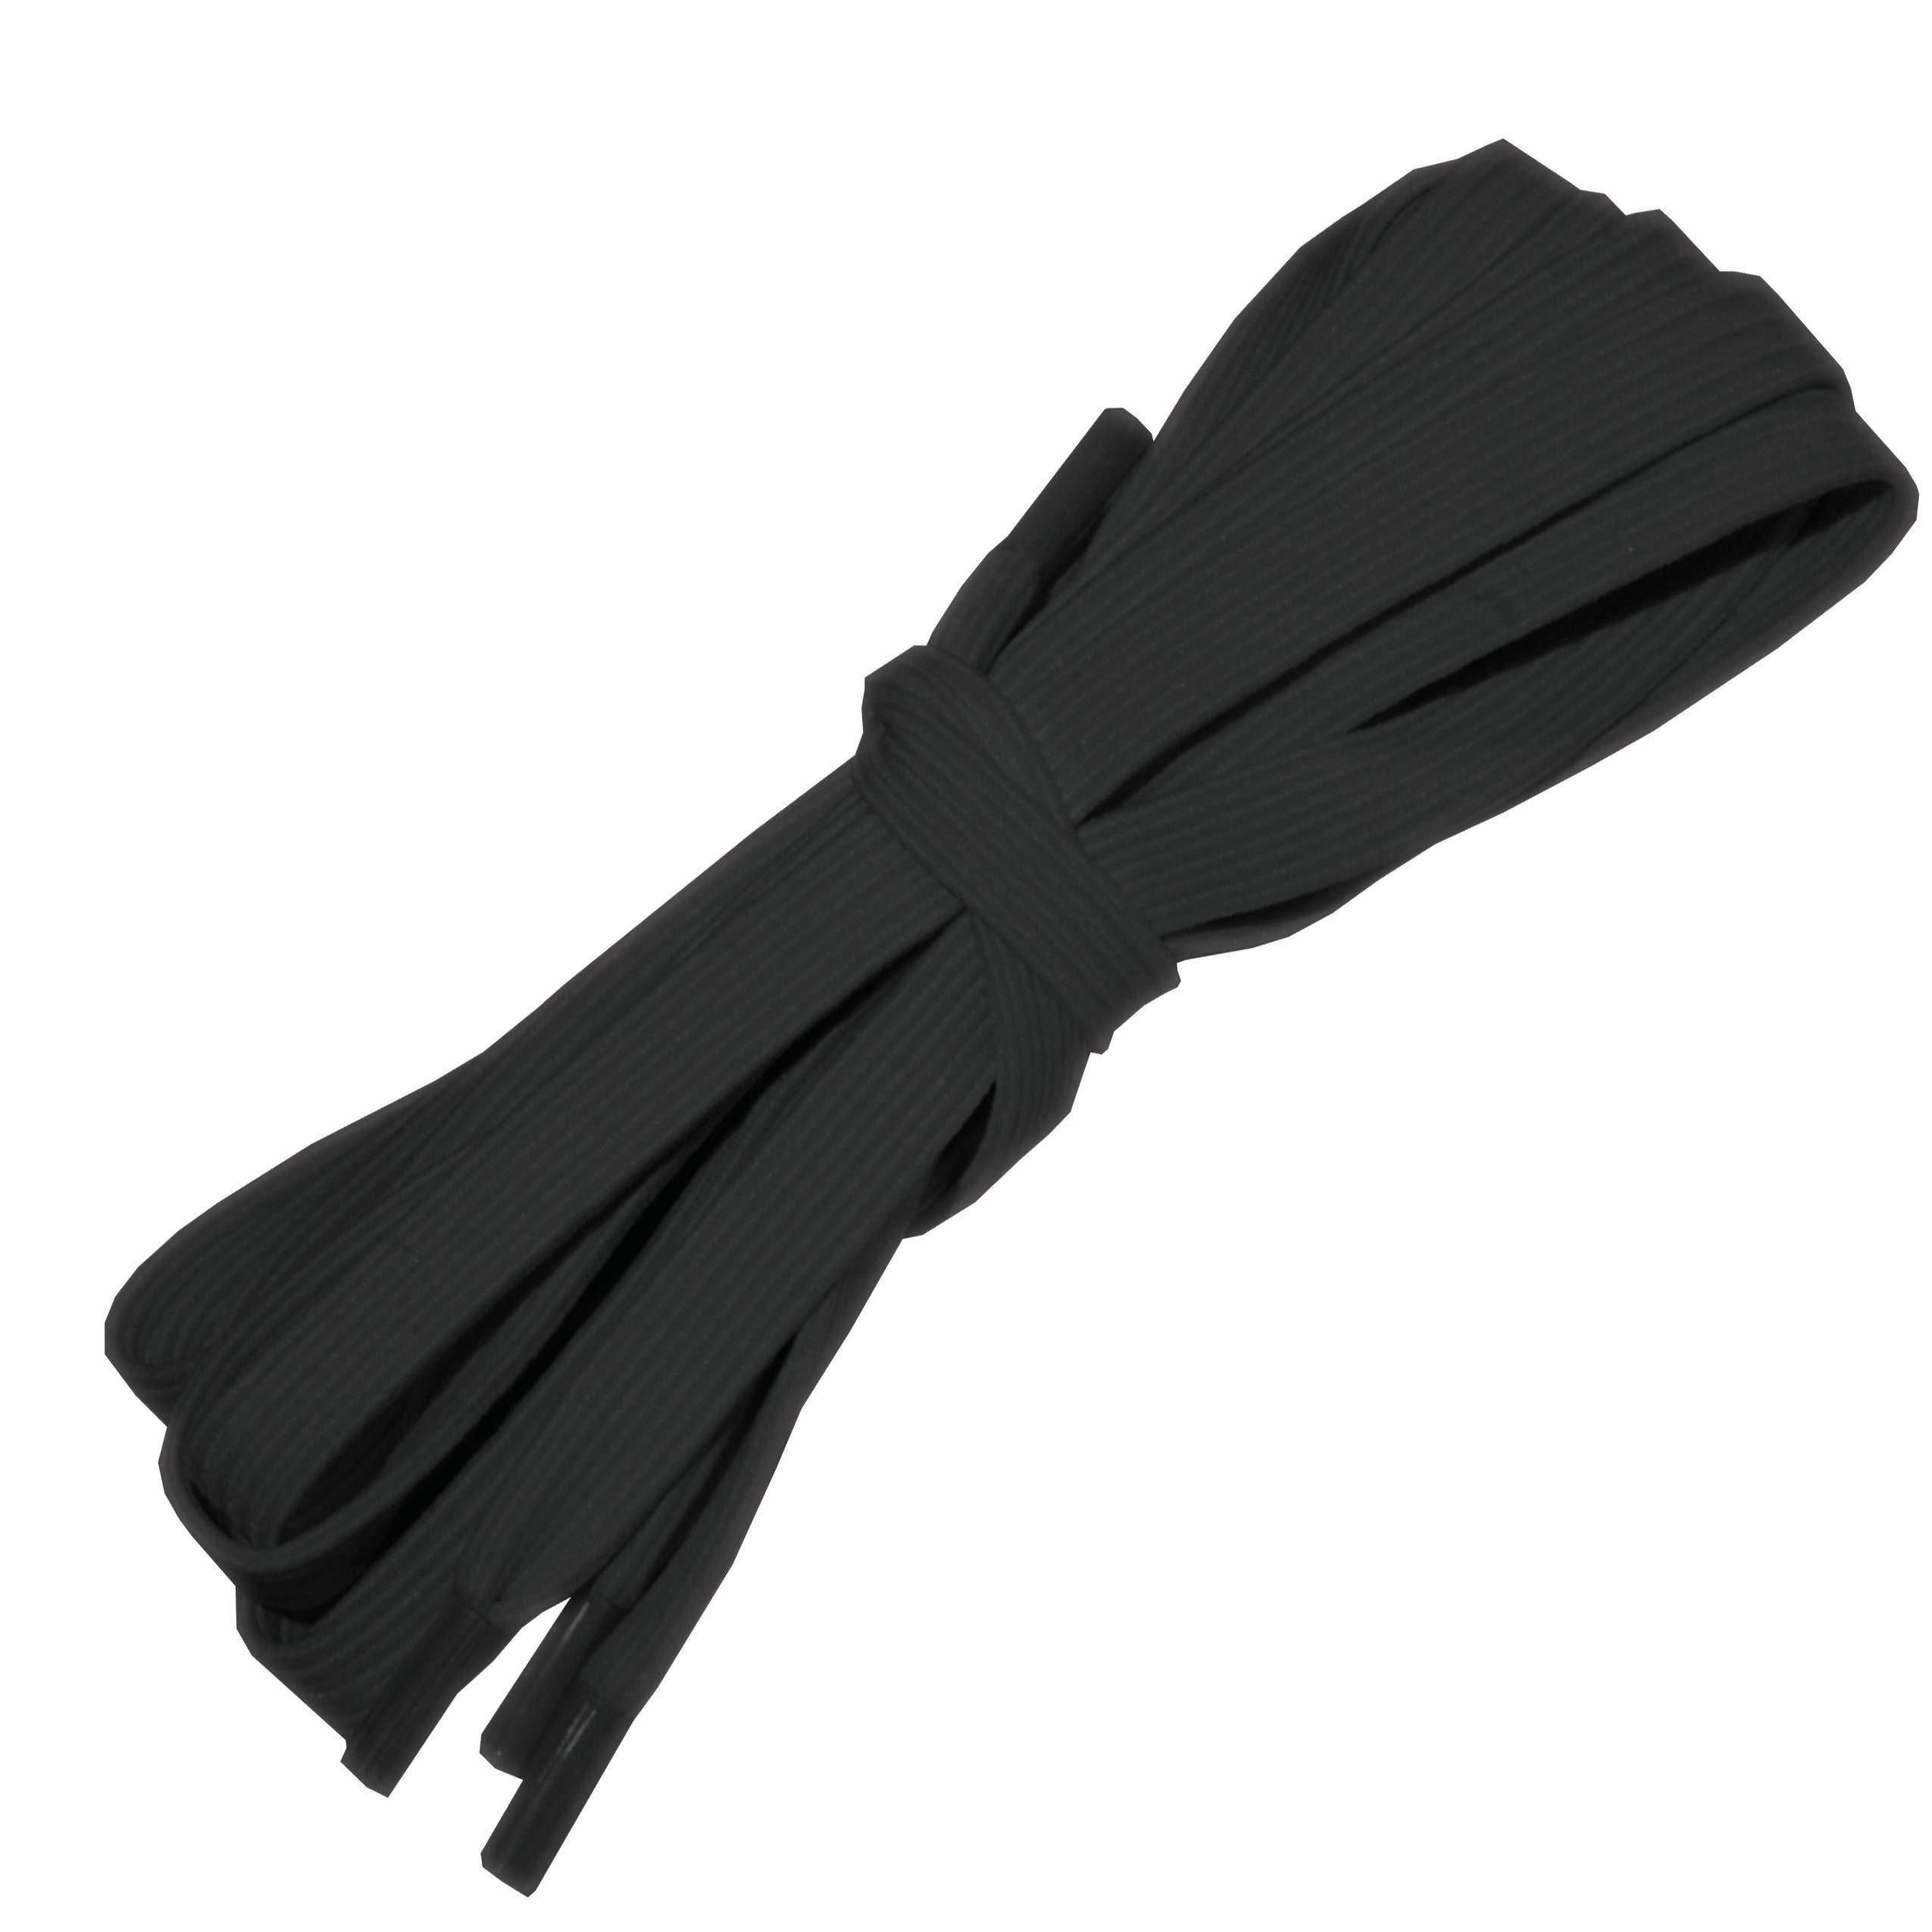 Wide Black Elastic Shoelaces, 26 Inches Long by Rehabilitation Advantage